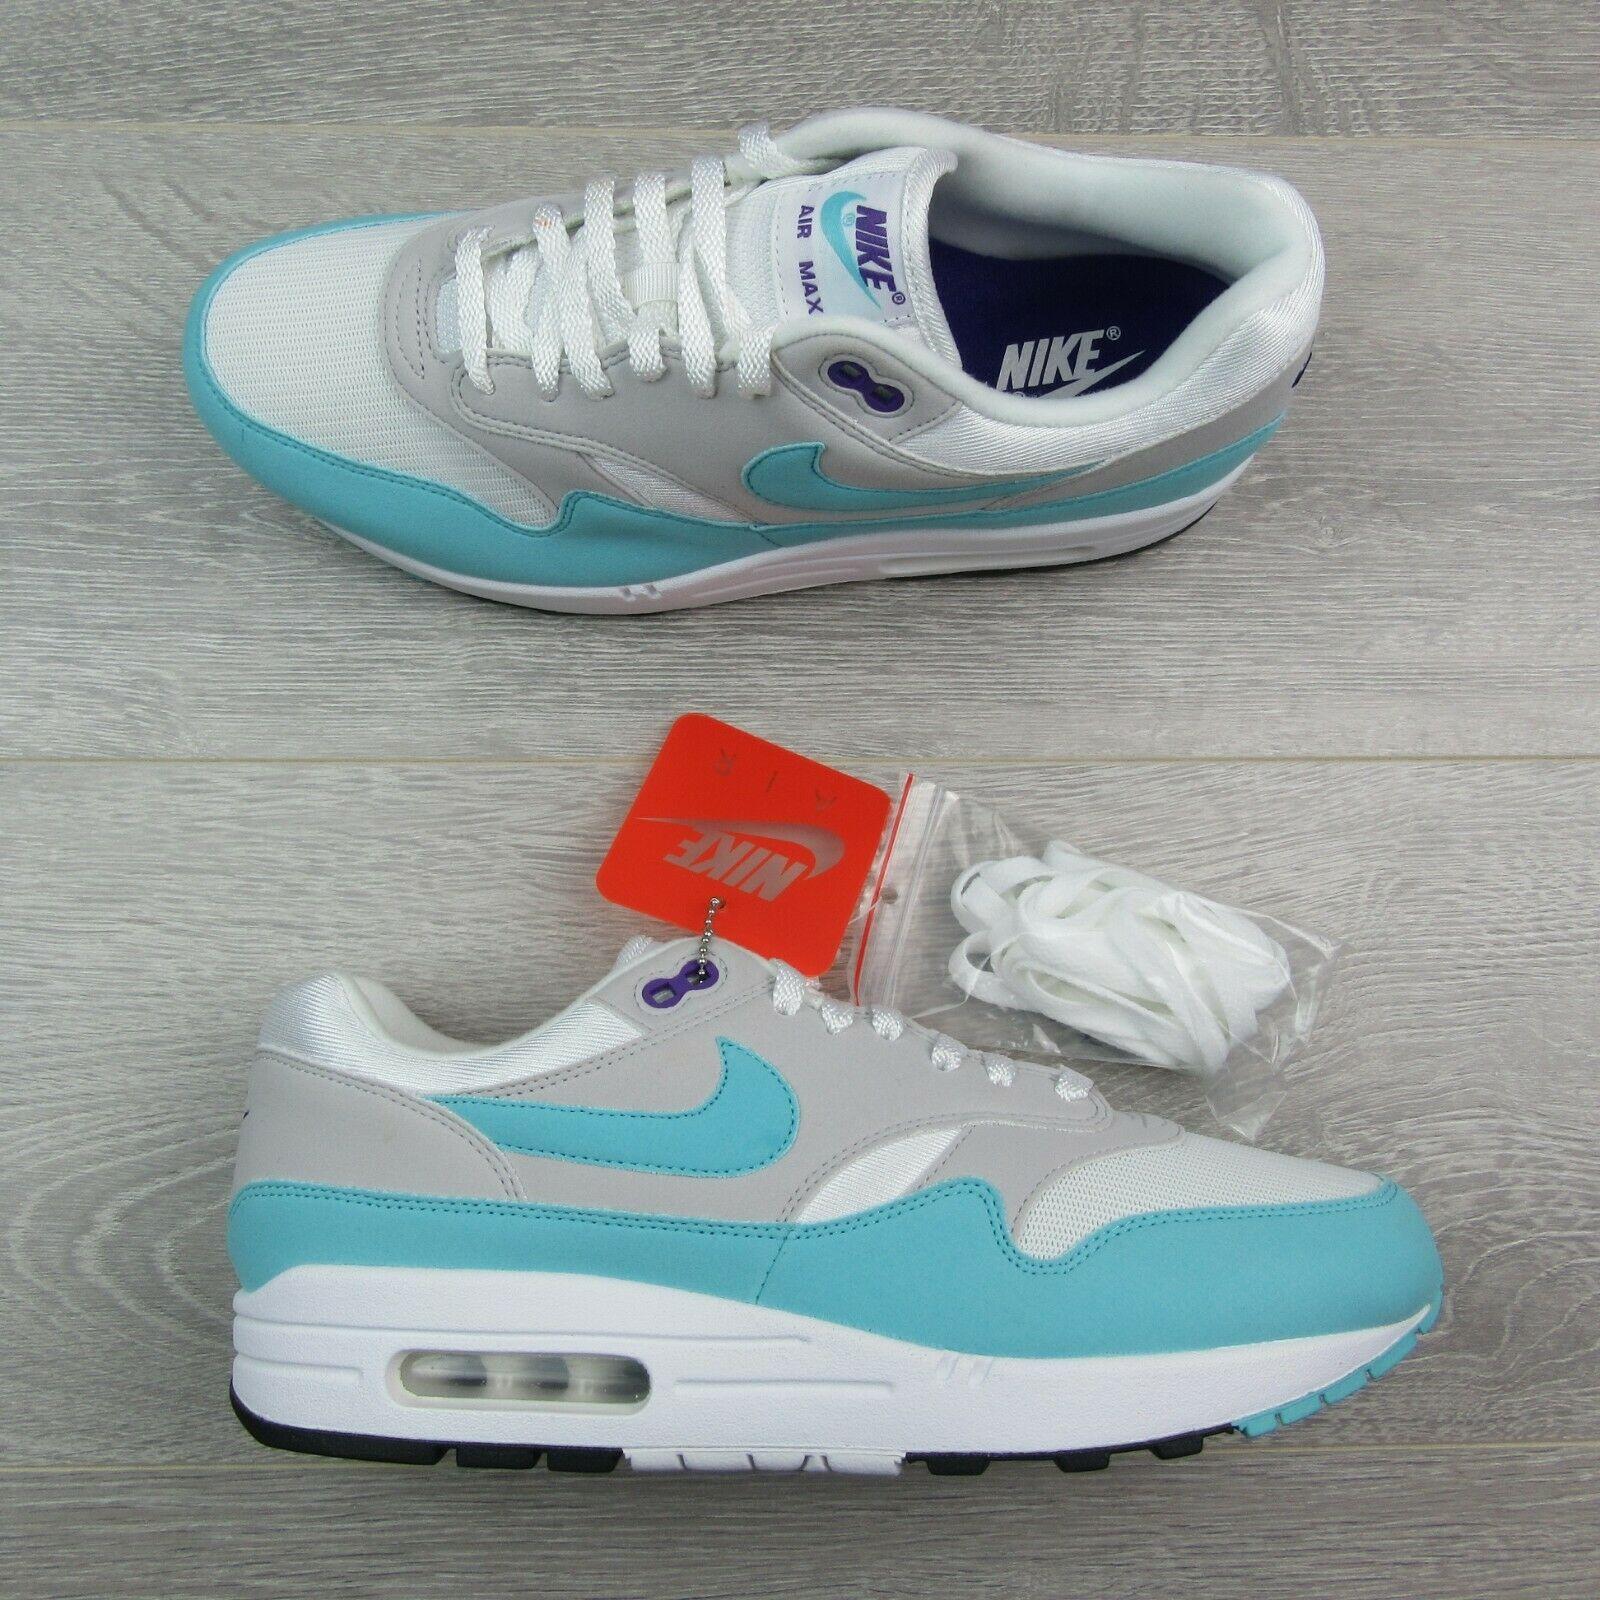 e88a229e41 Nike Air Max 1 Anniversary Aqua White Size 10 Mens Shoes 908375 105 New